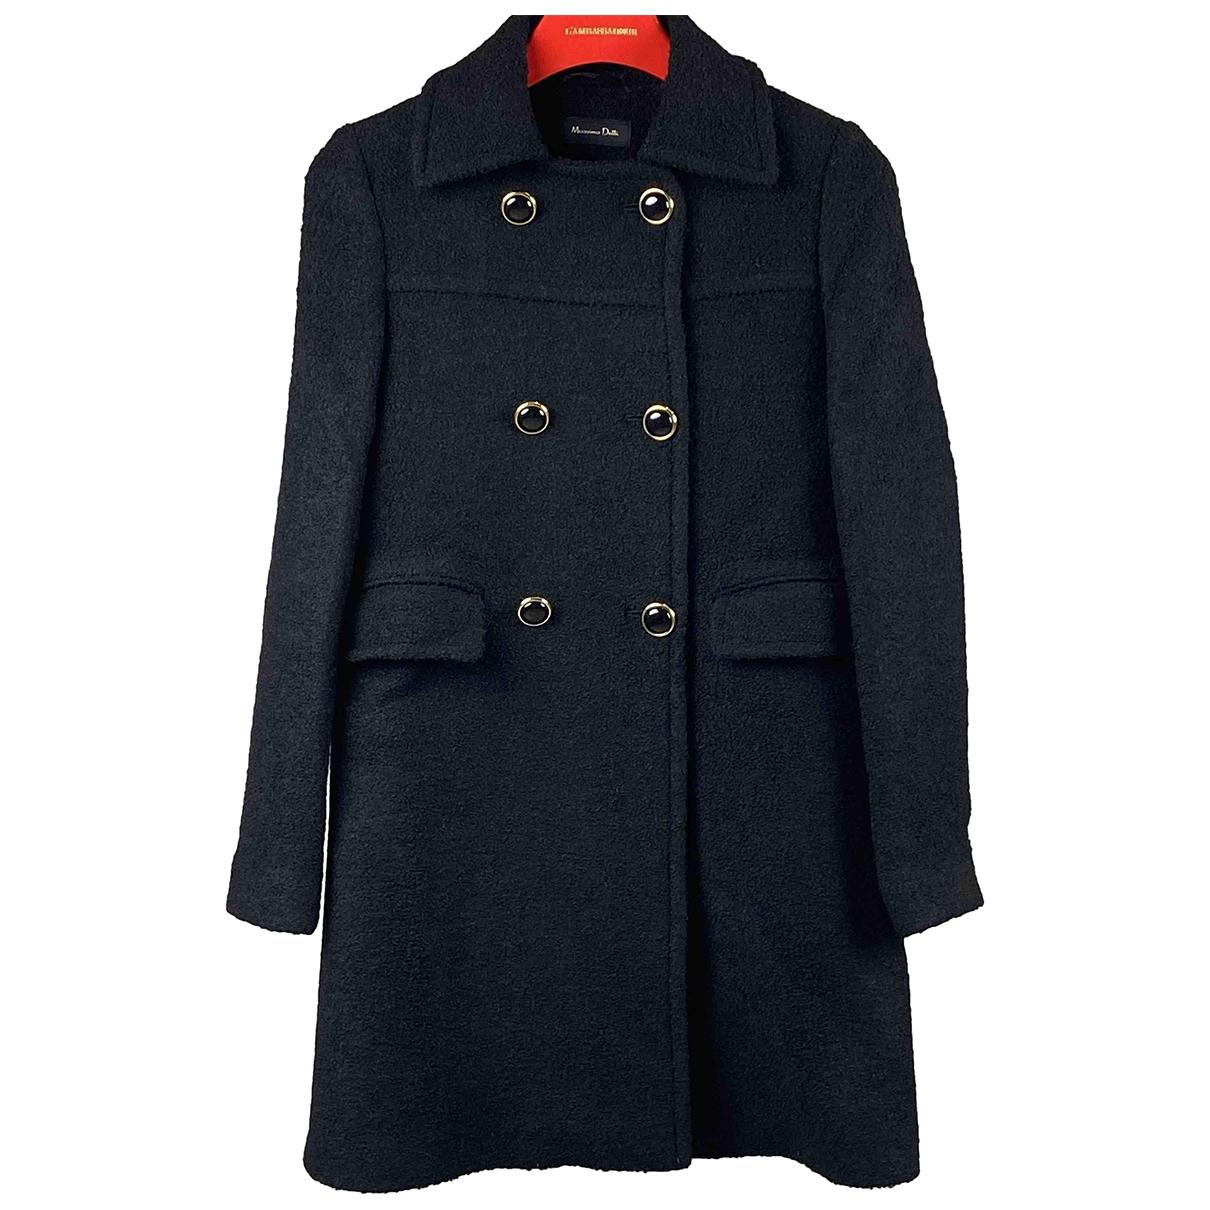 Massimo Dutti \N Black Wool coat for Women 36 IT